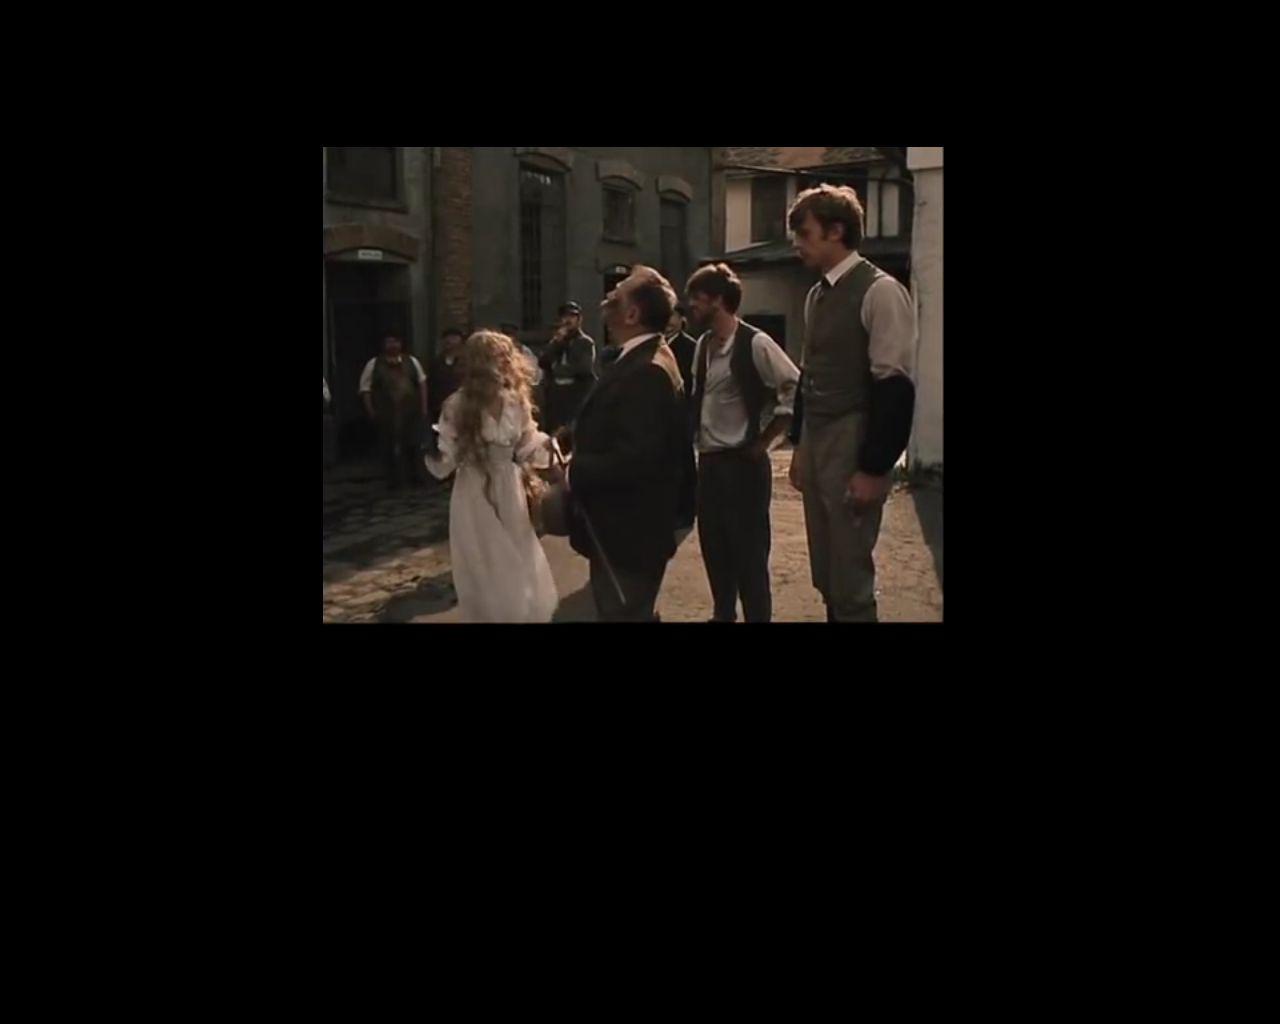 A sörfőzde udvara a filmben, a szereplőkkel, Mariska, Dr. Gruntorad, Pepin, Francin